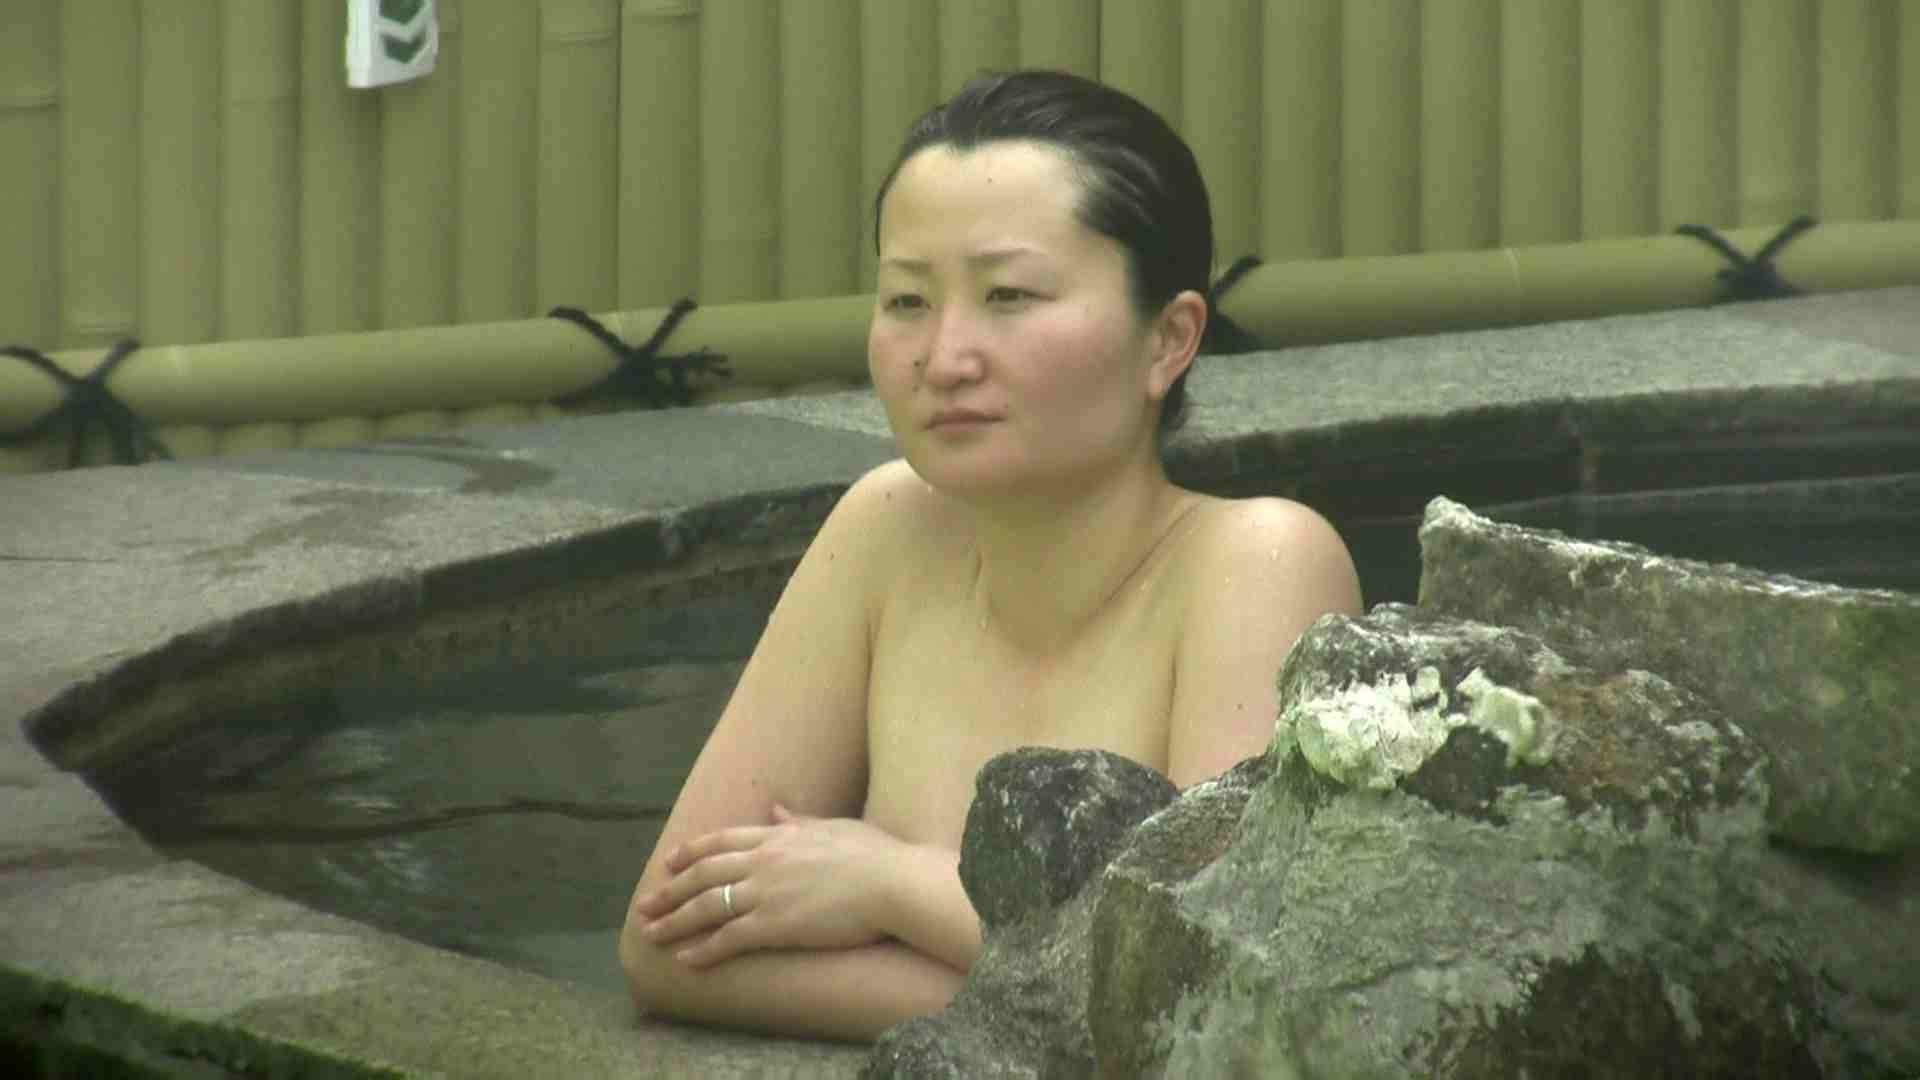 Aquaな露天風呂Vol.632 露天 戯れ無修正画像 70画像 5